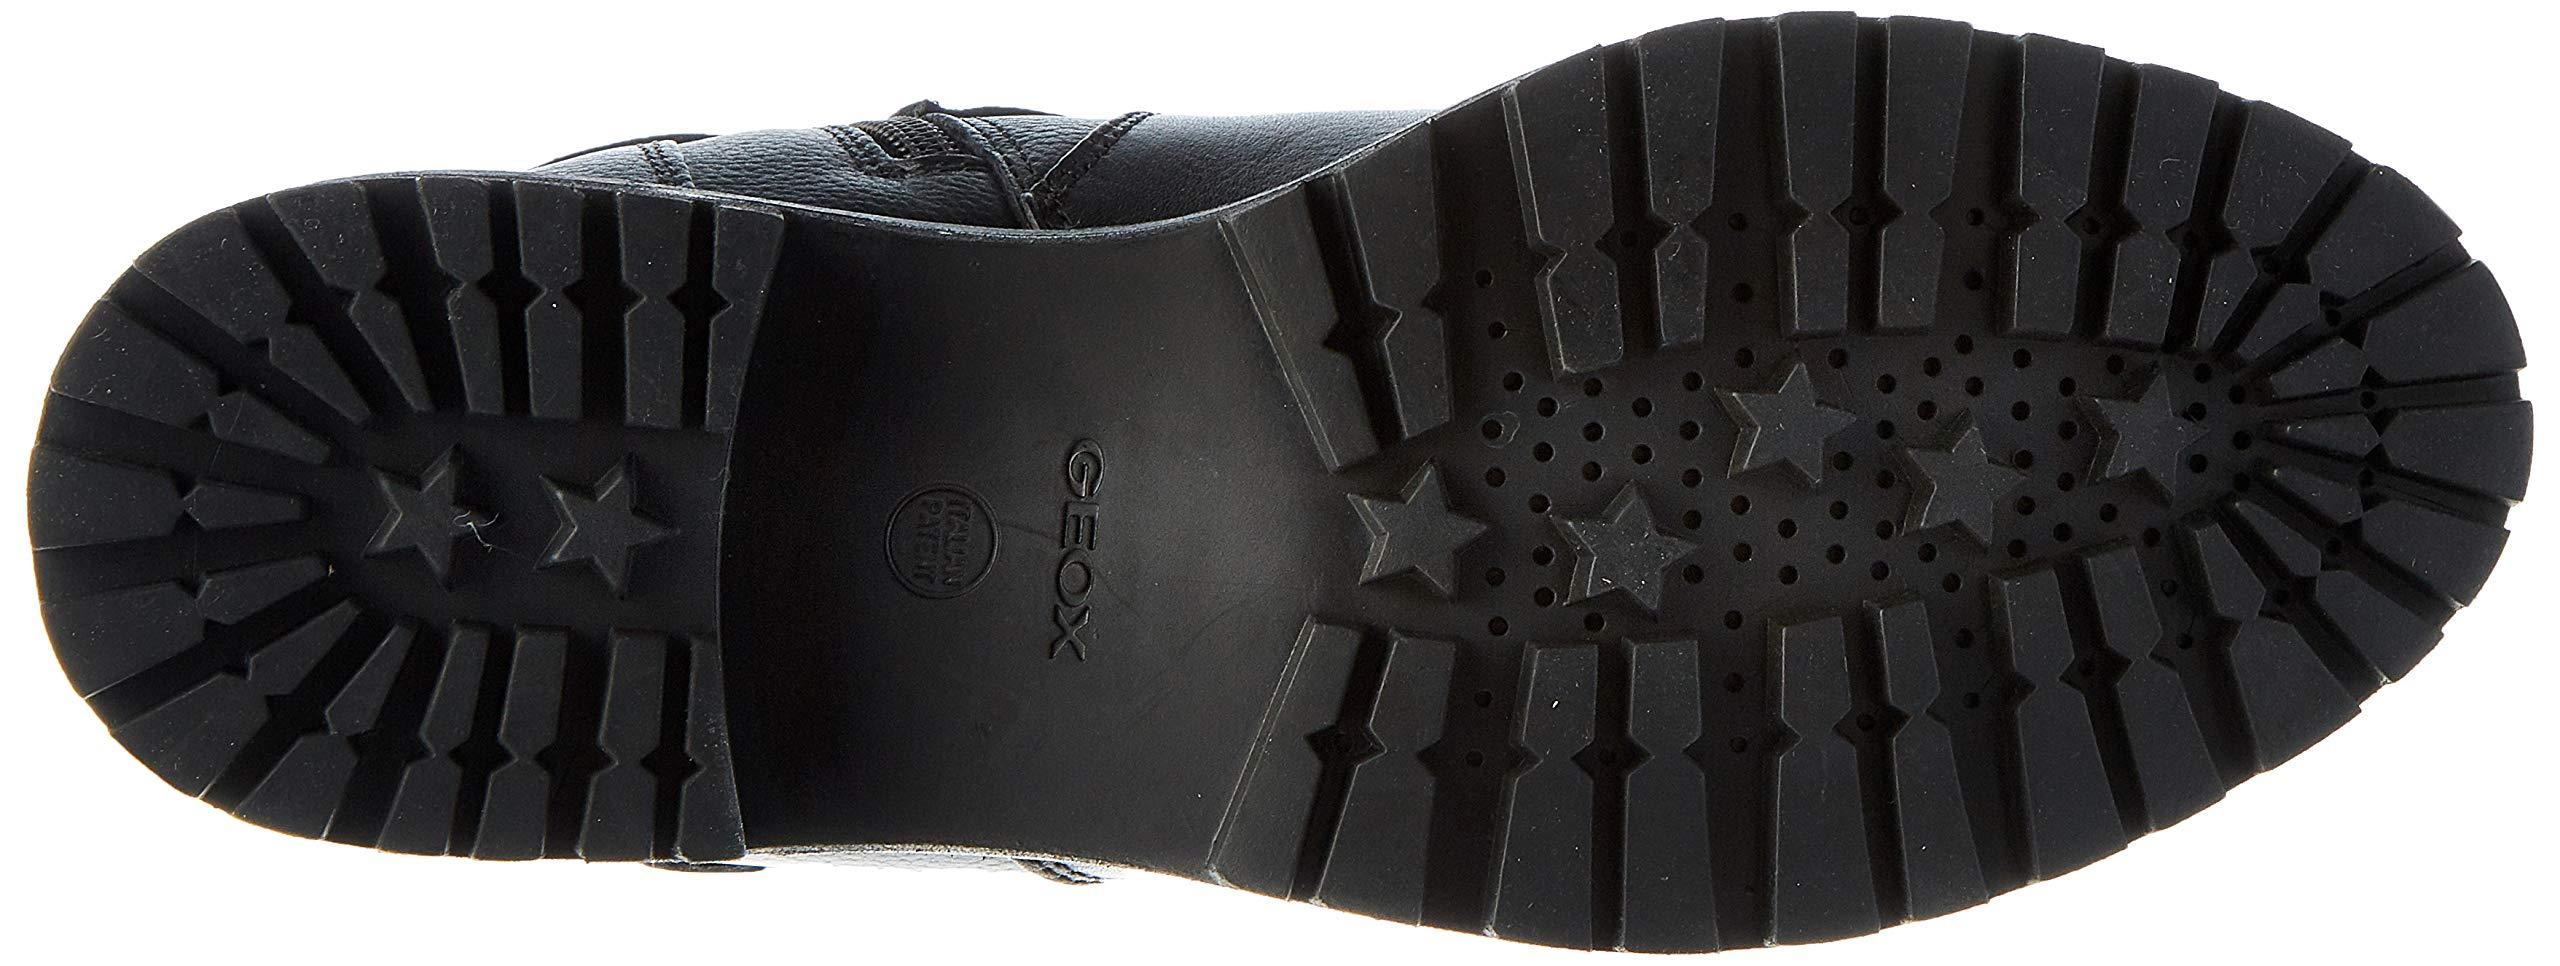 Geox Damen D Hoara C Biker Boots 3